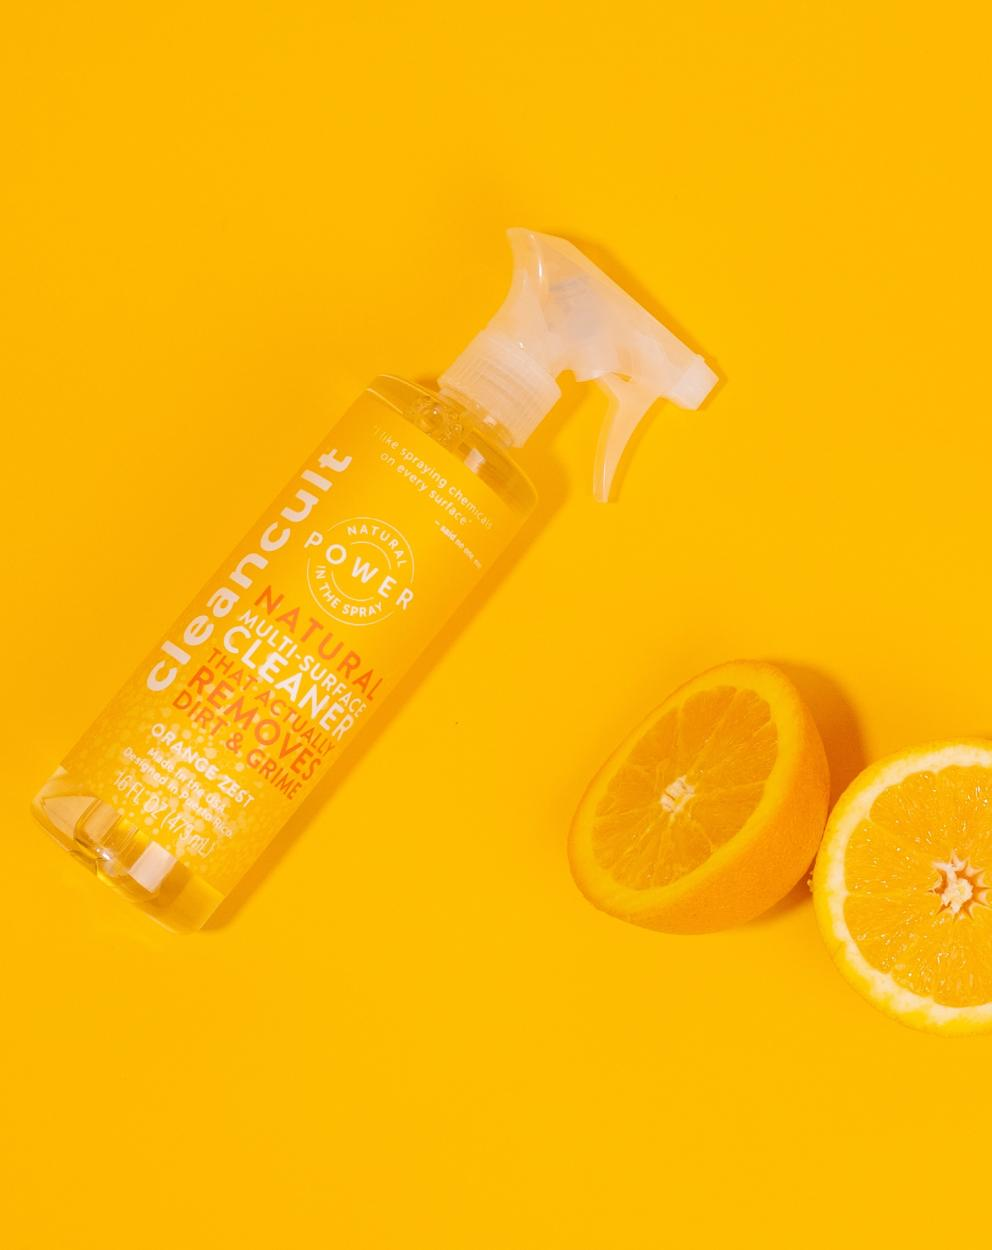 All Purpose Cleaner Orange Zest